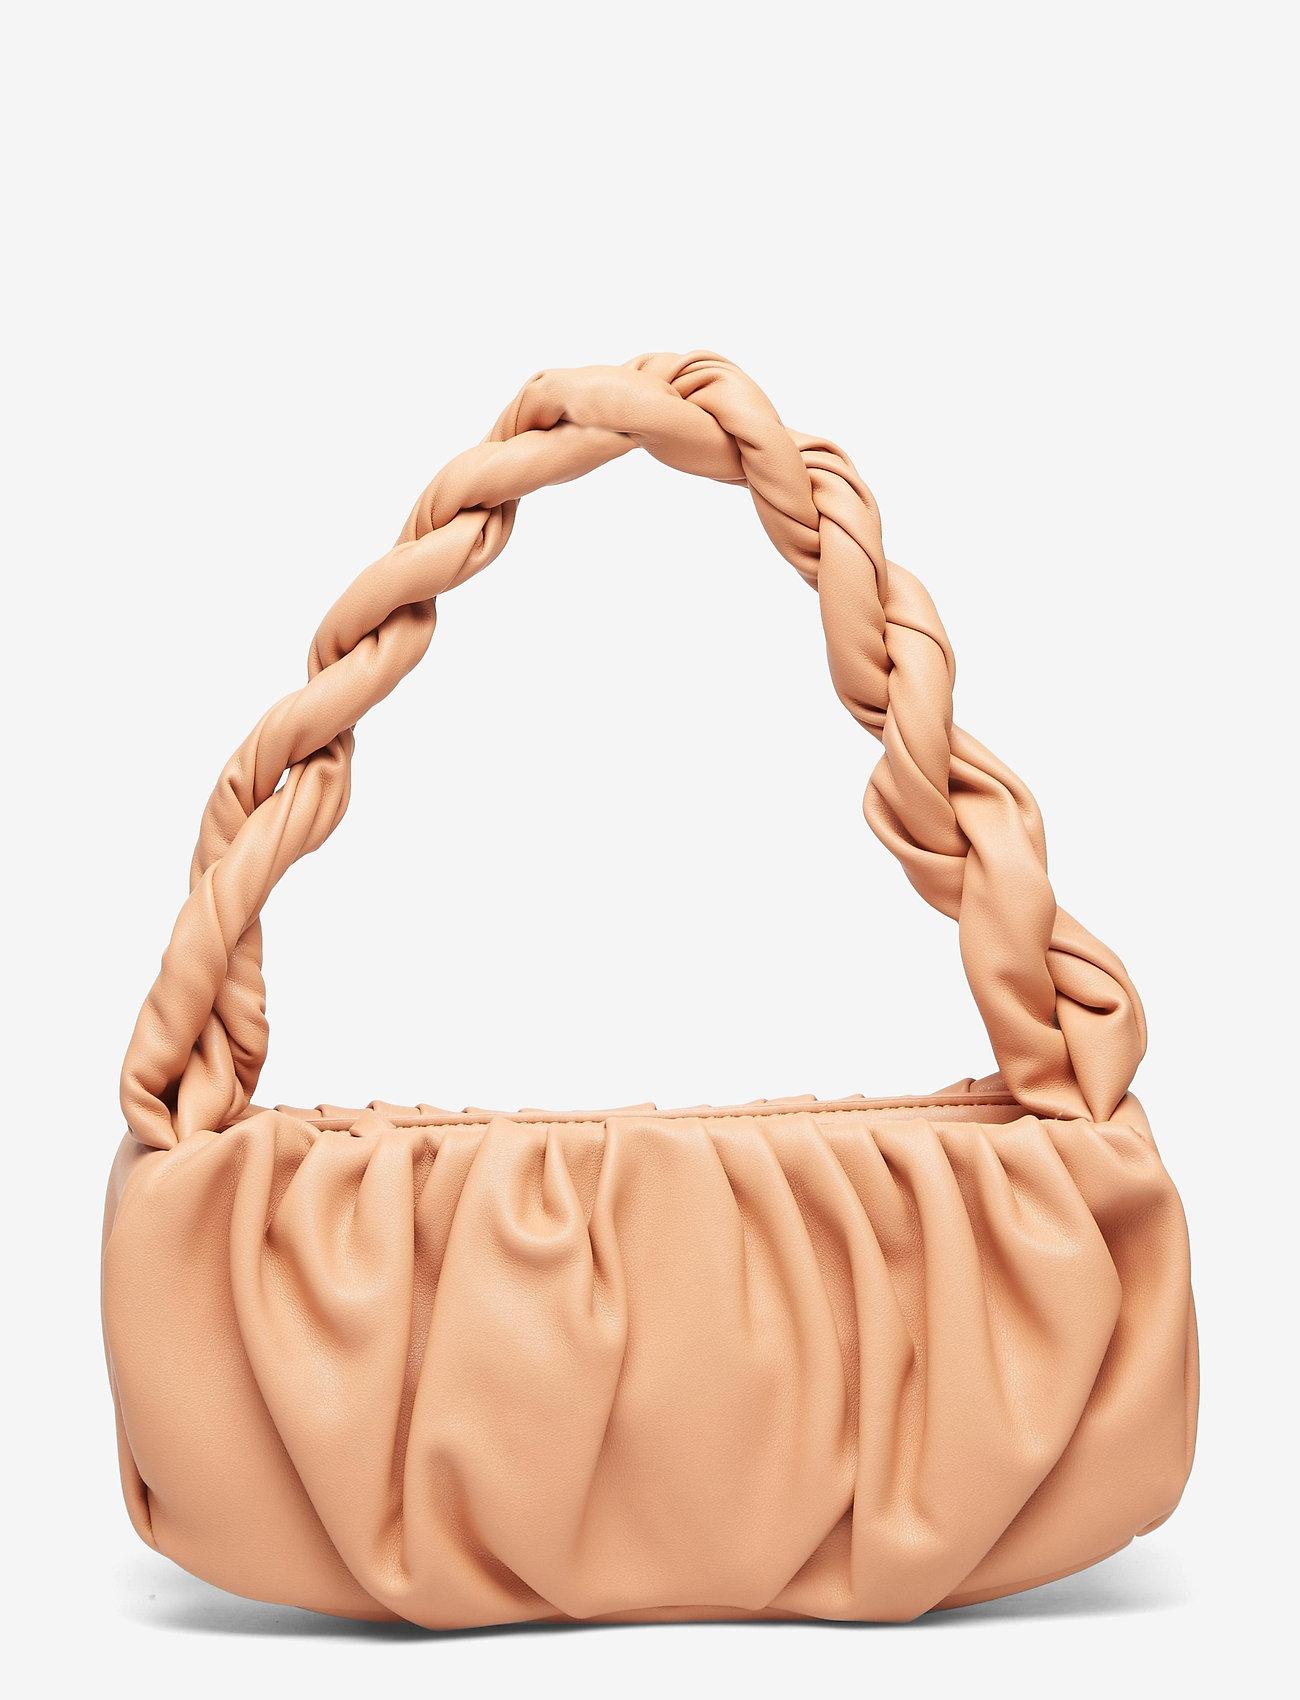 Mango - FUSILLI - handväskor - light/pastel orange - 0